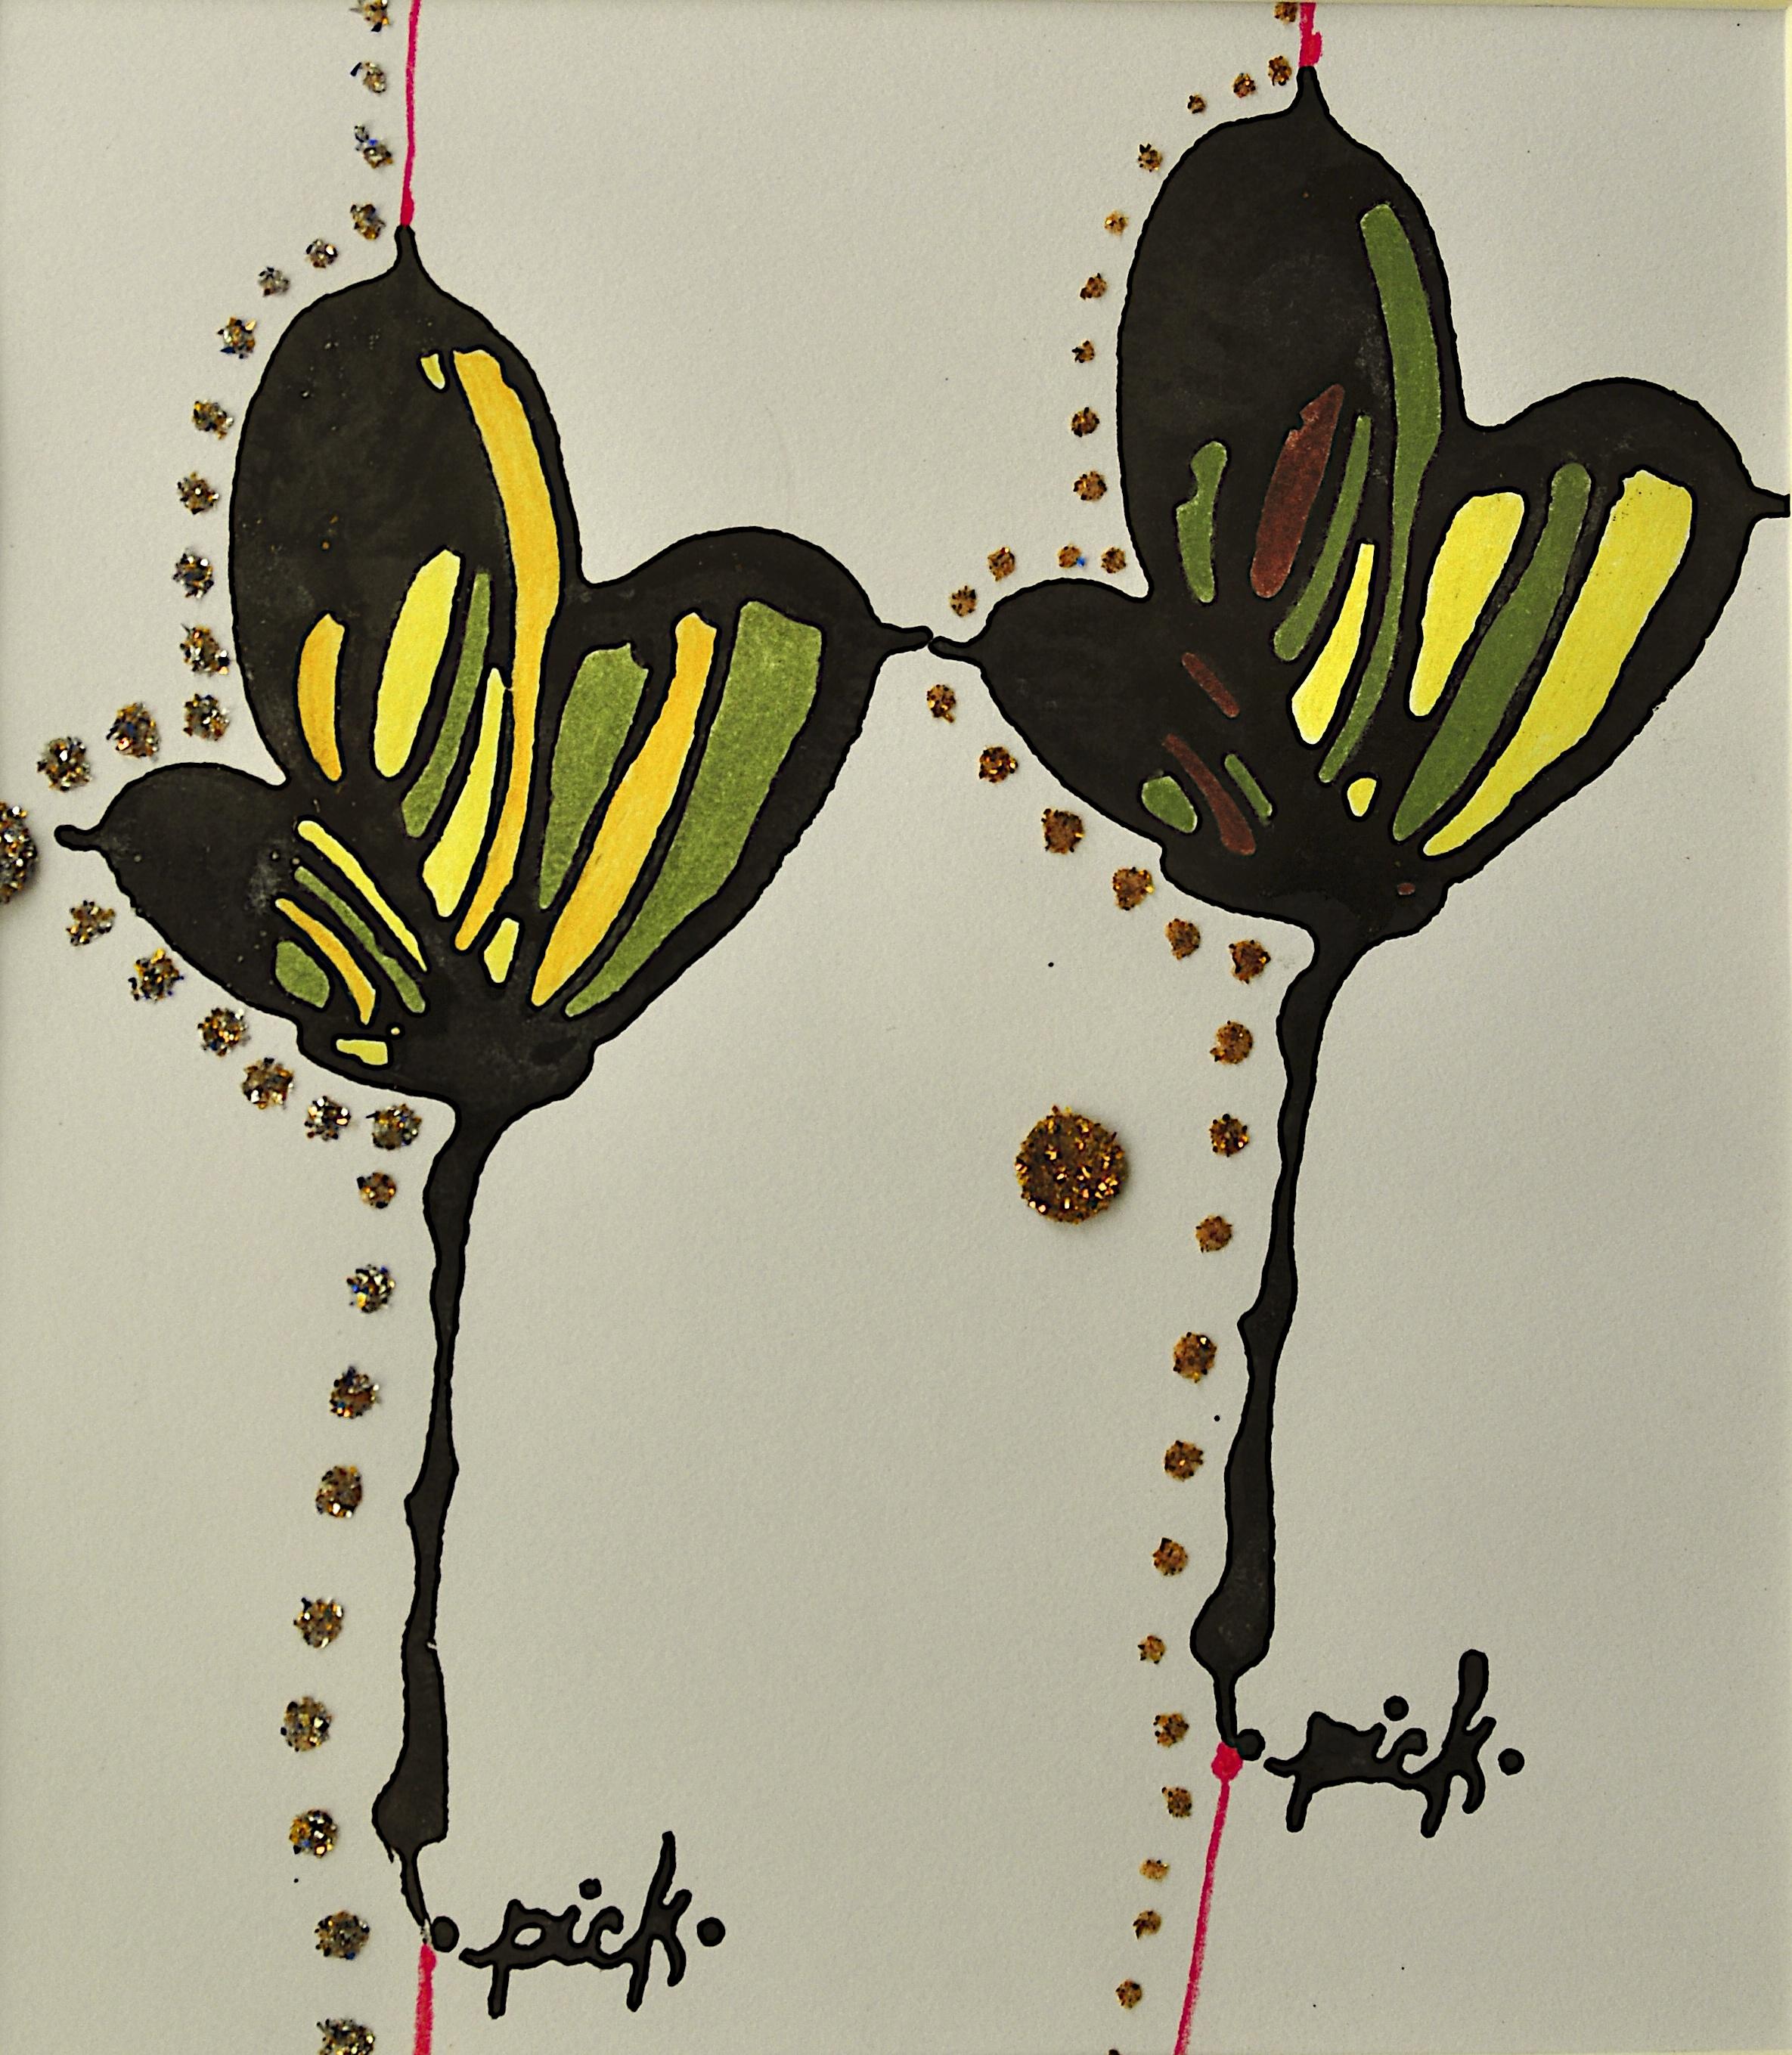 "'they, Assam', handmade paper (Jaipur), block print, ink, glitter, colored pencil, 13"" x 7"", 2013"